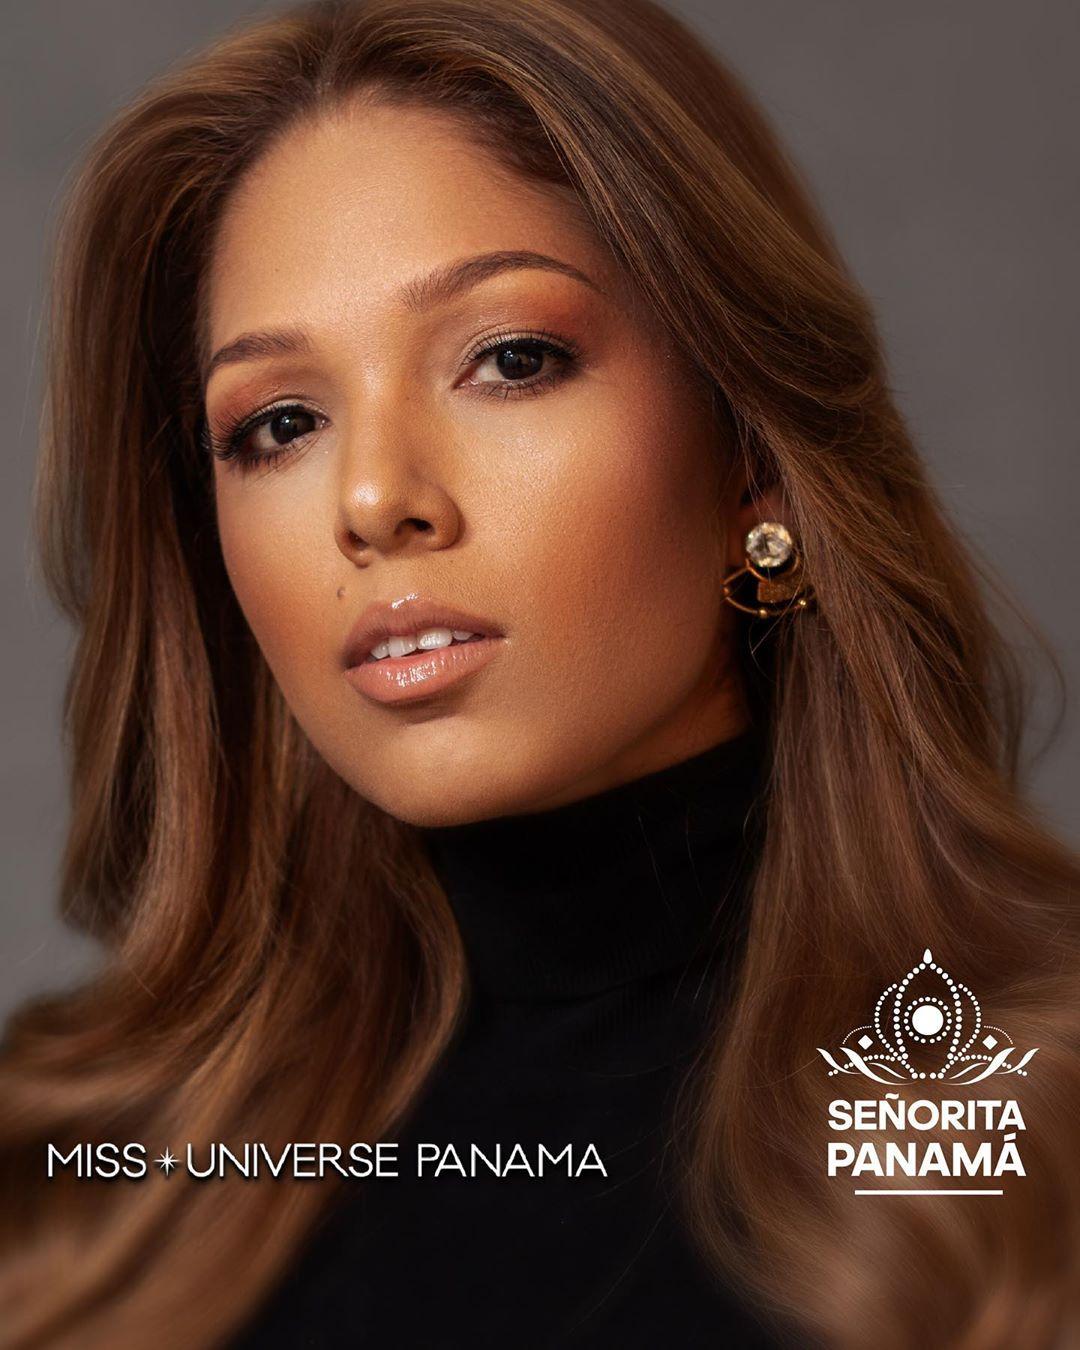 candidatas a senorita panama 2020. final: 16 may. - Página 2 Iit9hw